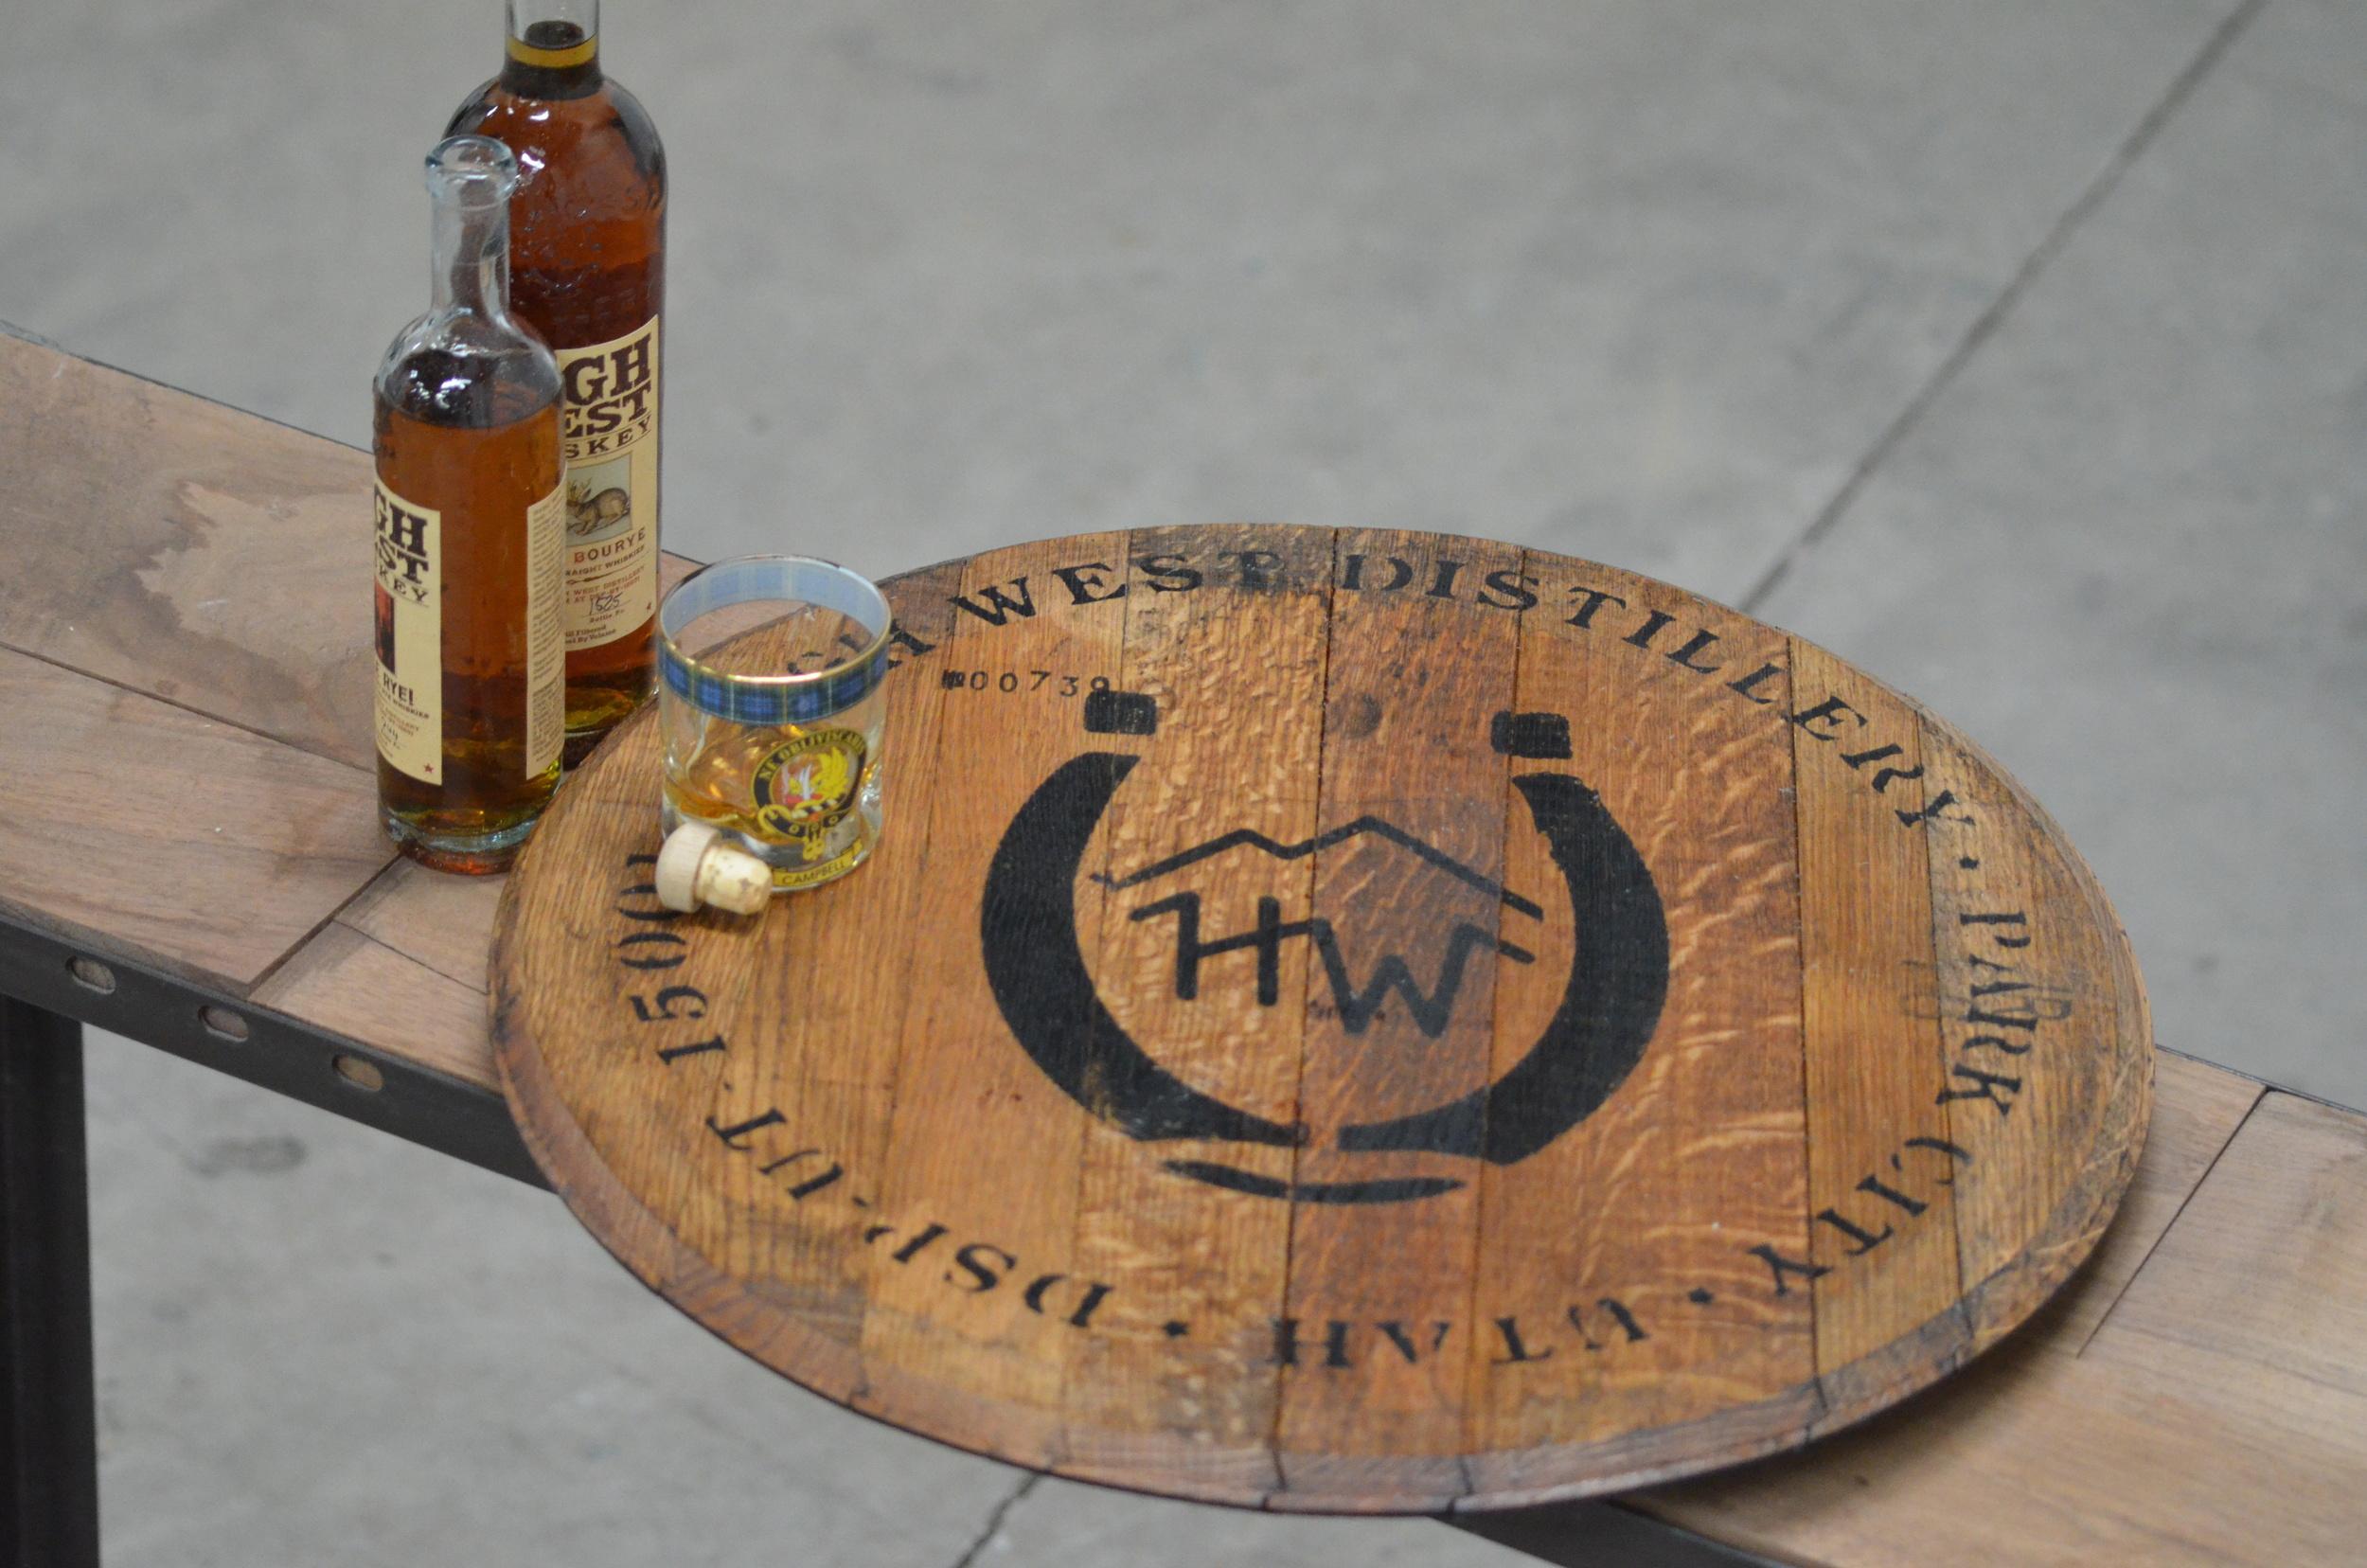 High West Distillery Lazy Susa_Styled2.JPG